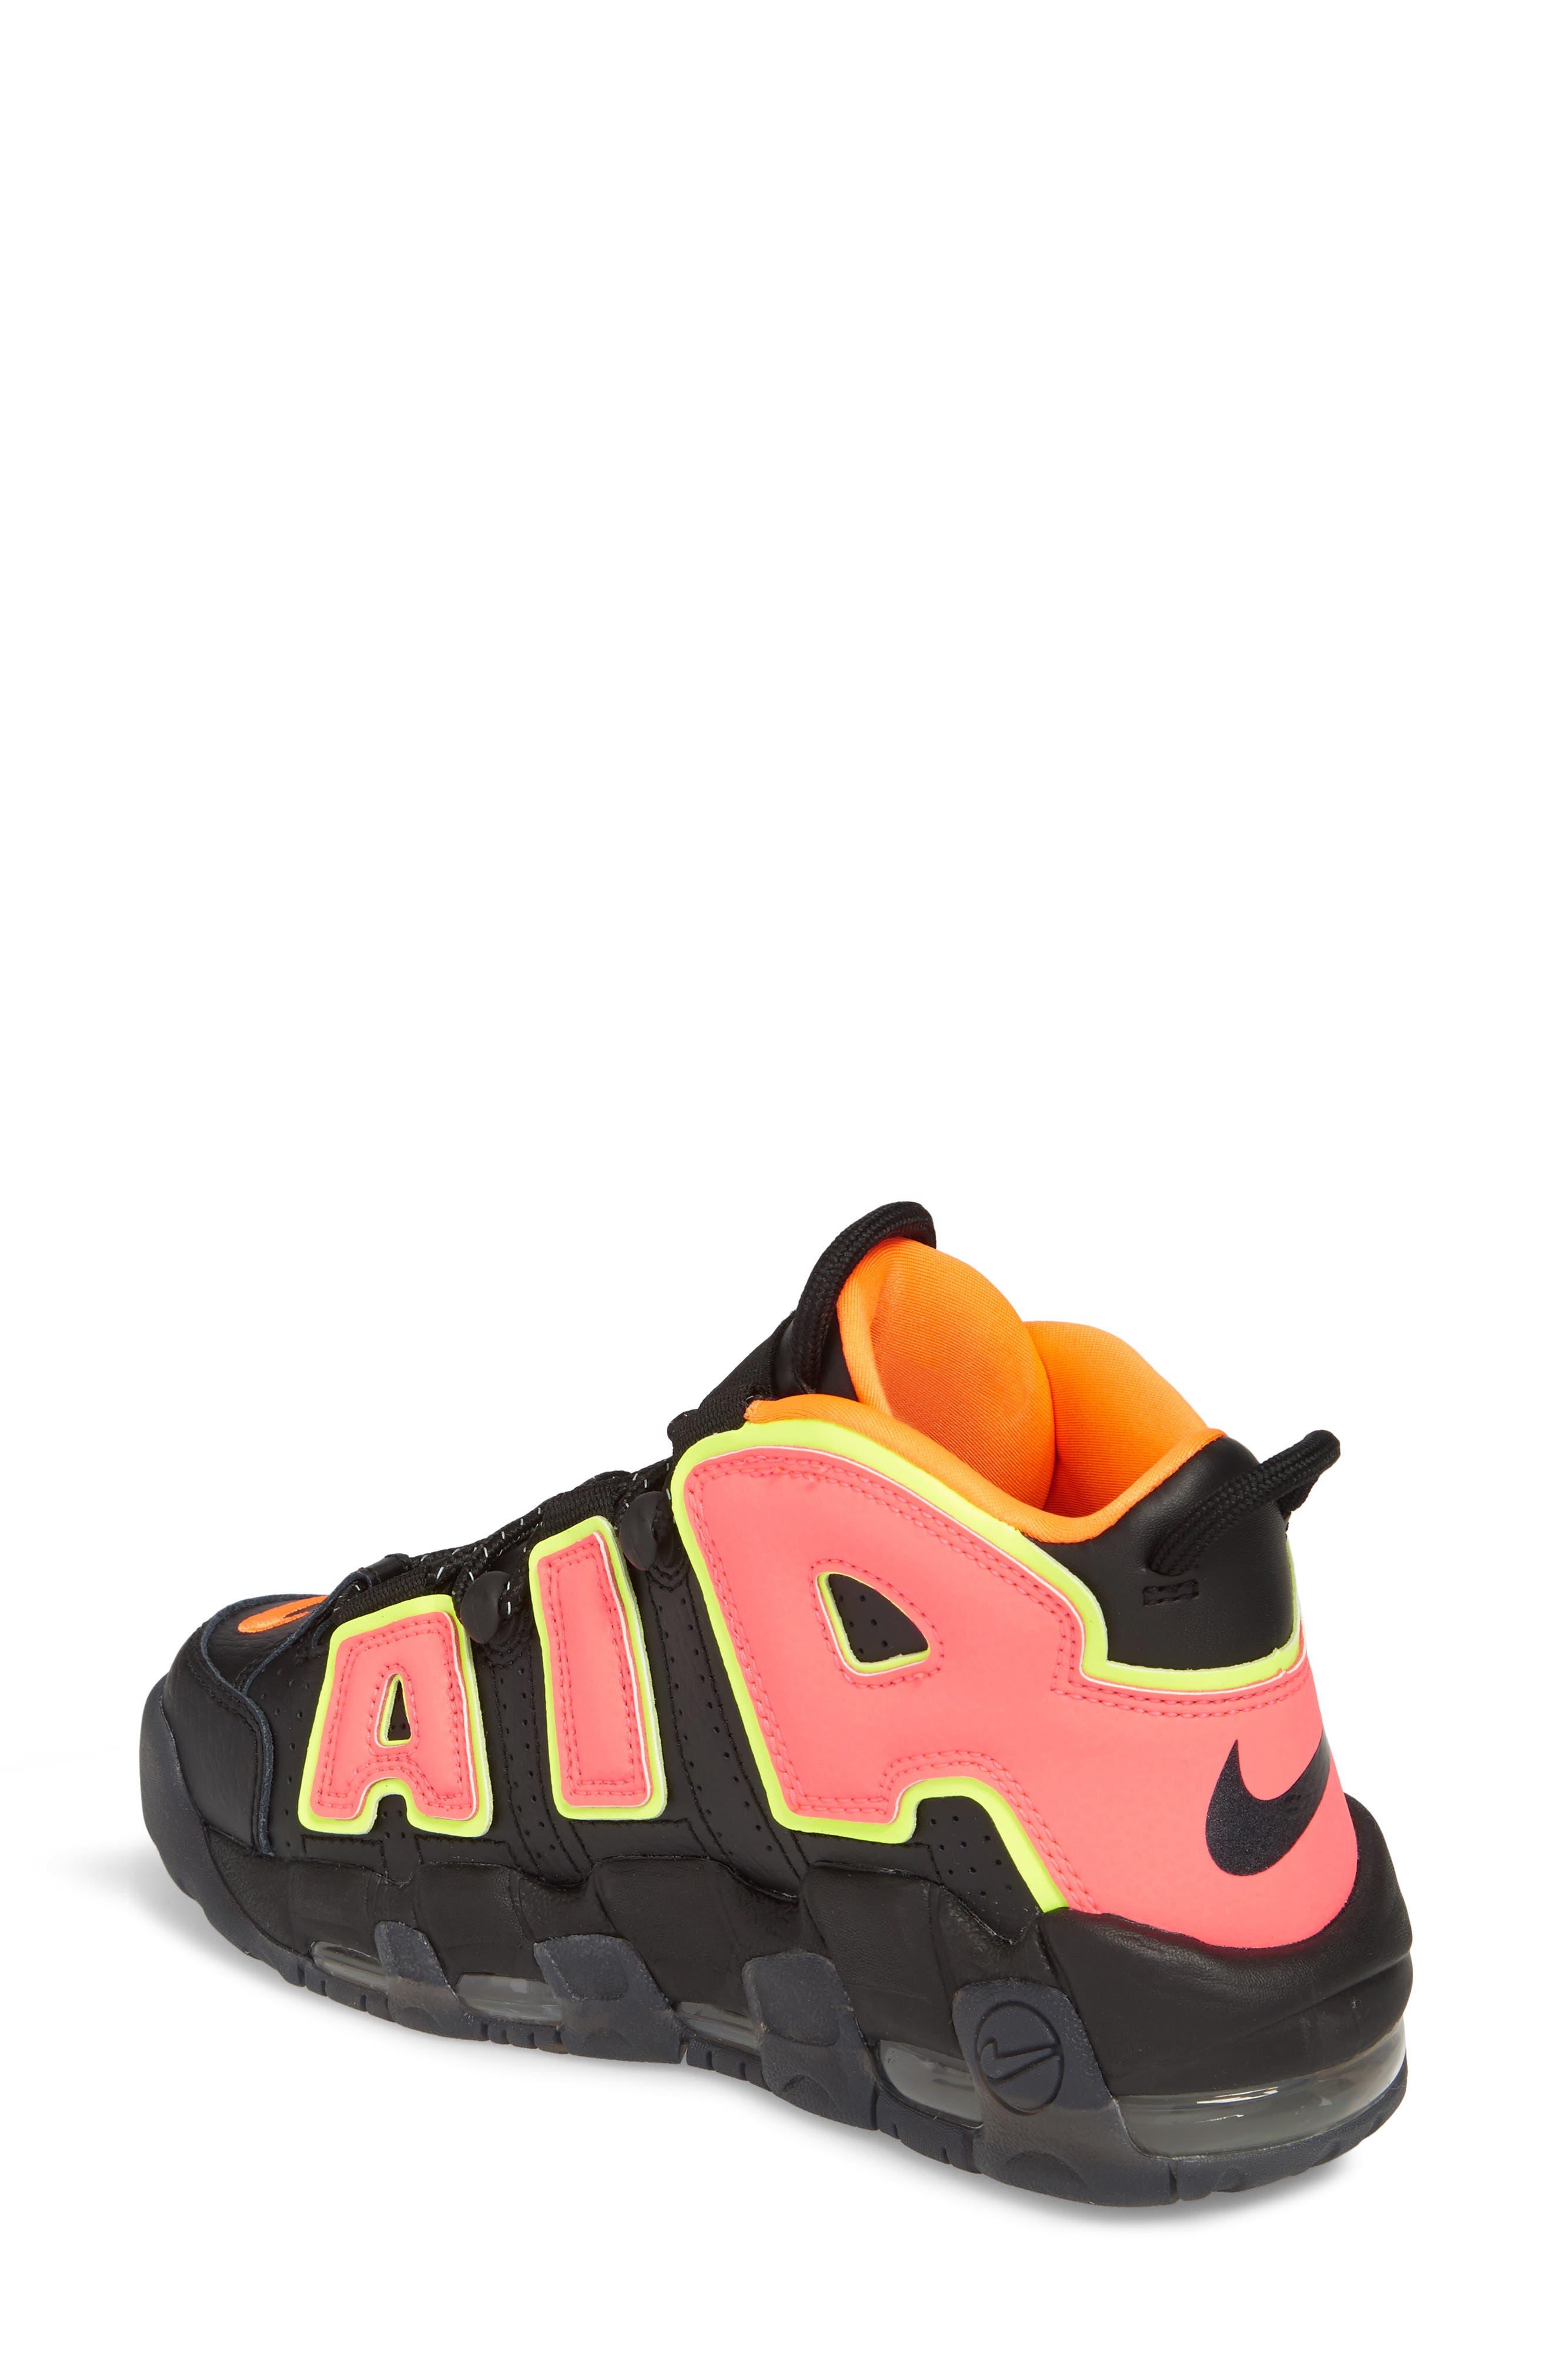 Air More Uptempo Sneaker,                             Alternate thumbnail 2, color,                             Black/ Punch/ Total Orange